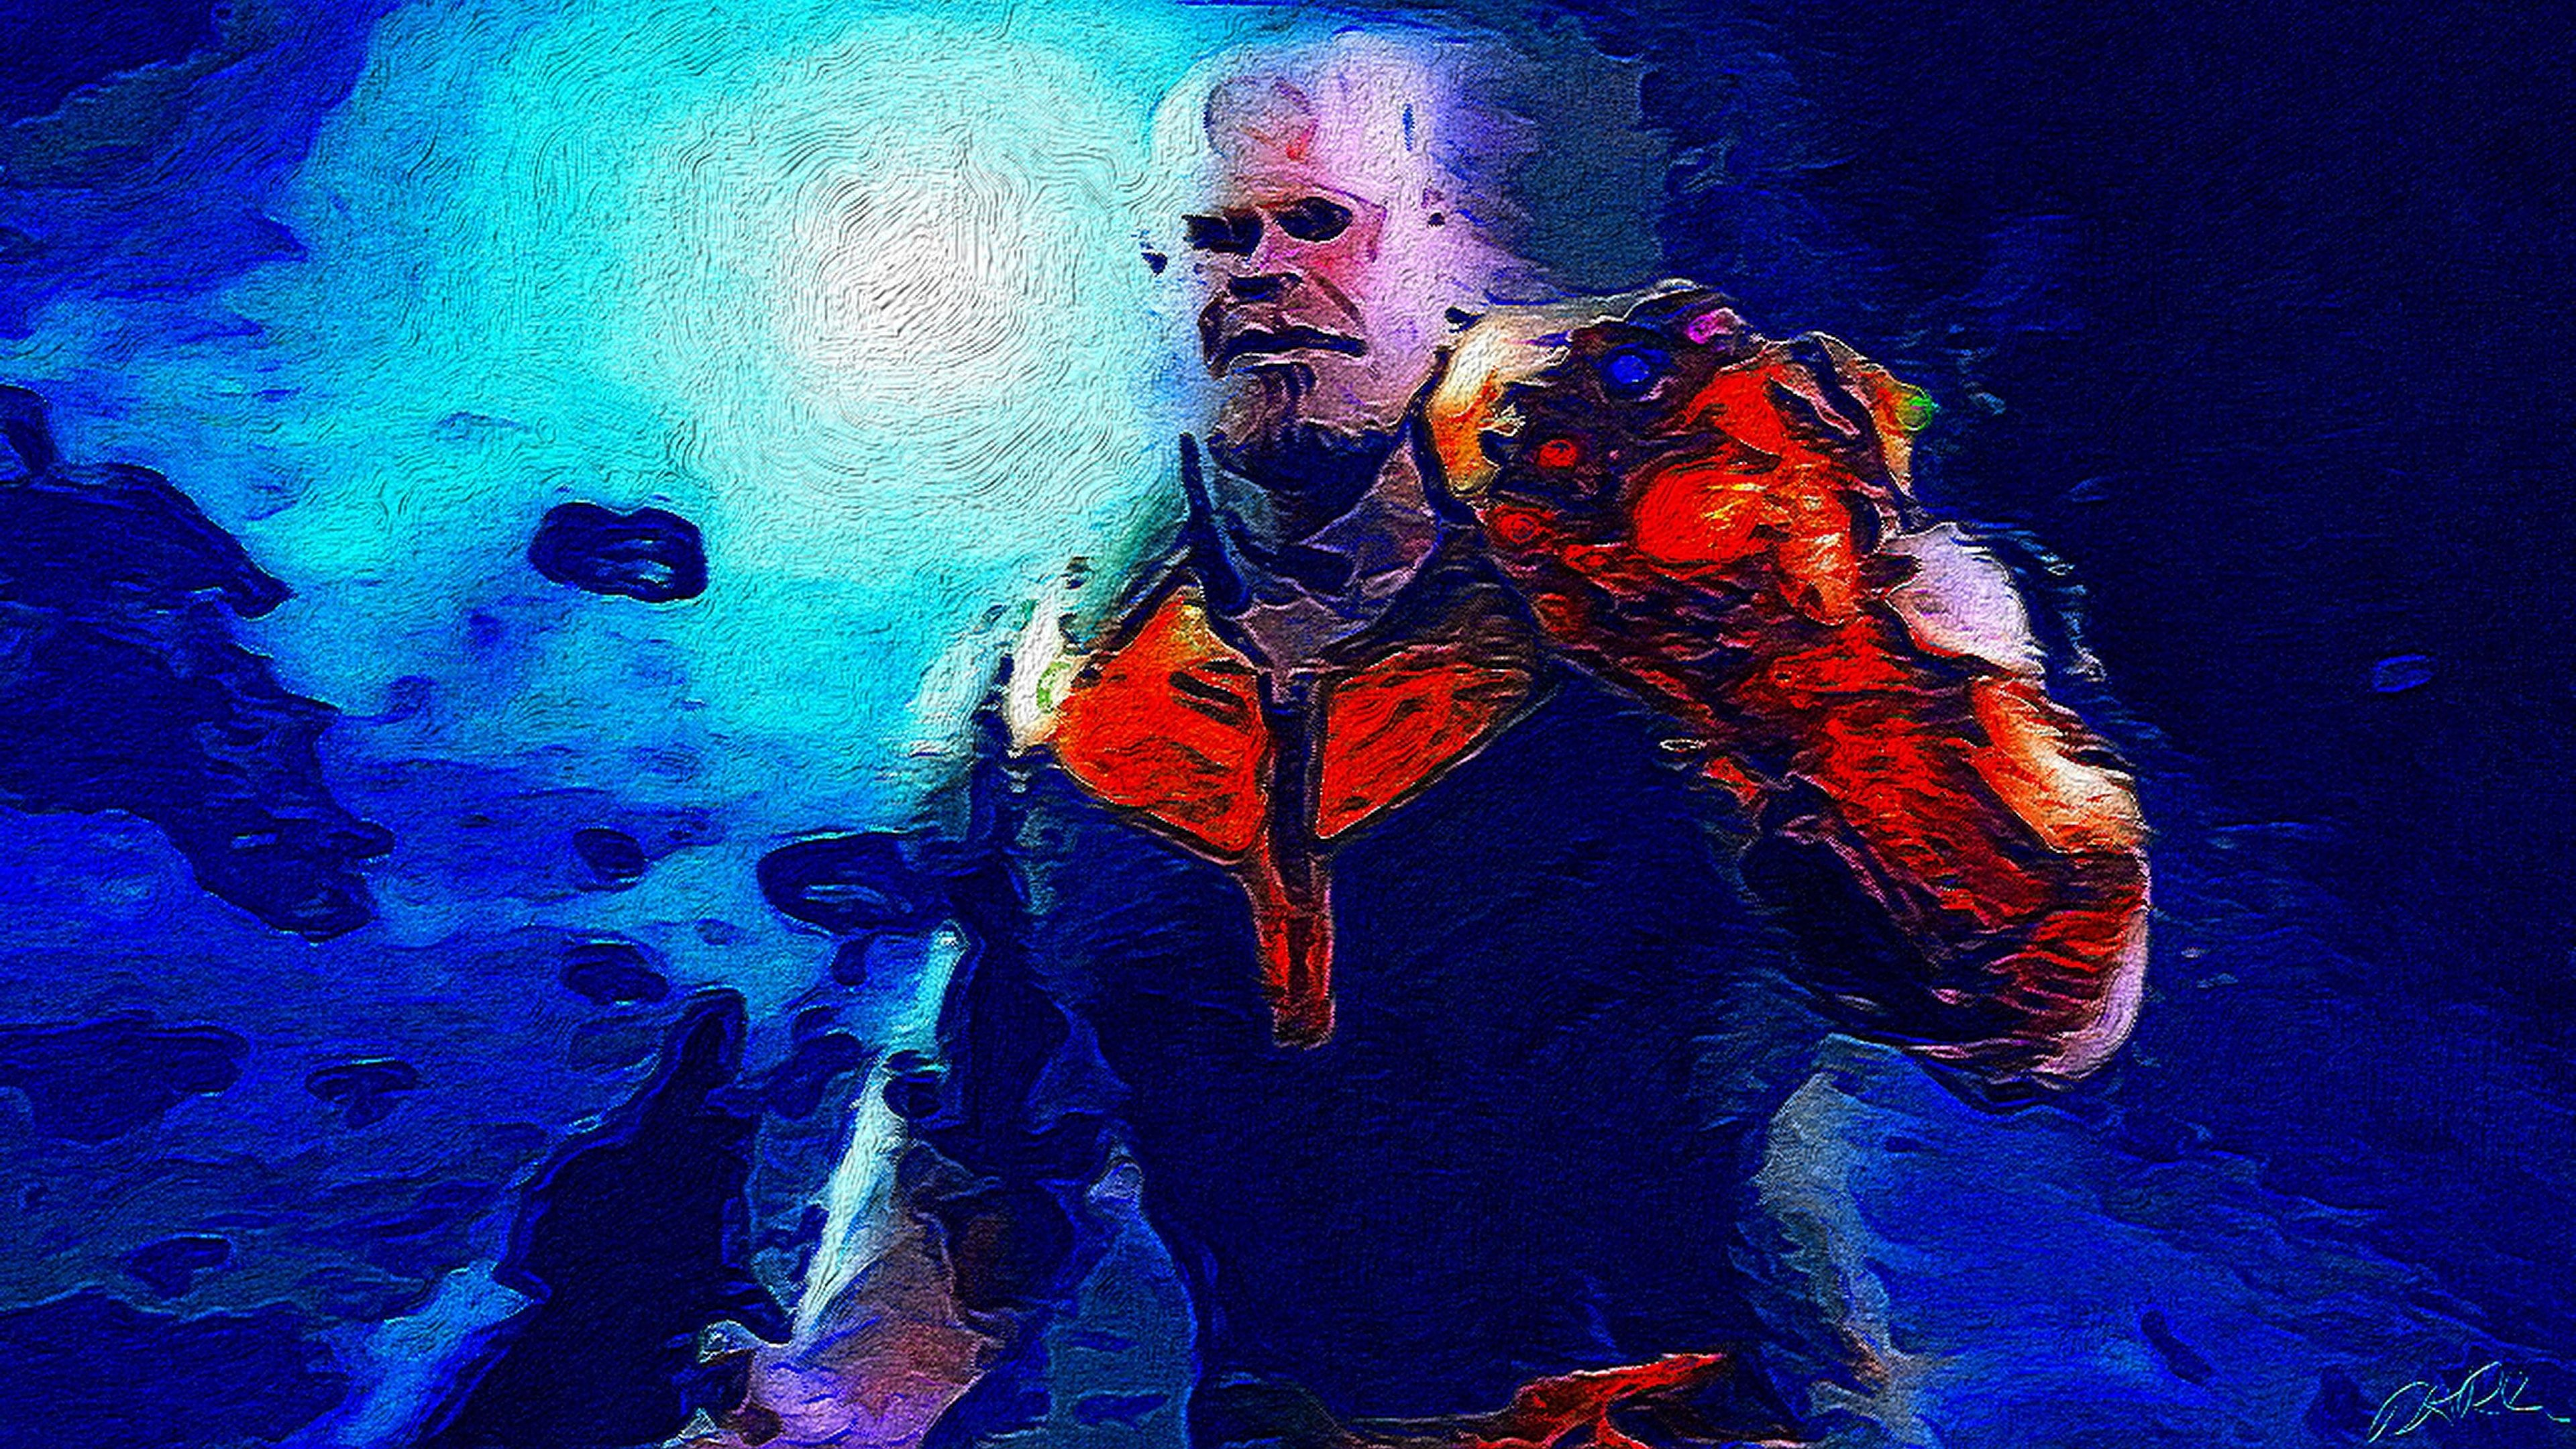 thanos oil painting 4k 1543620285 - Thanos Oil Painting 4k - thanos-wallpapers, supervillain wallpapers, superheroes wallpapers, marvel wallpapers, hd-wallpapers, digital art wallpapers, artwork wallpapers, 4k-wallpapers